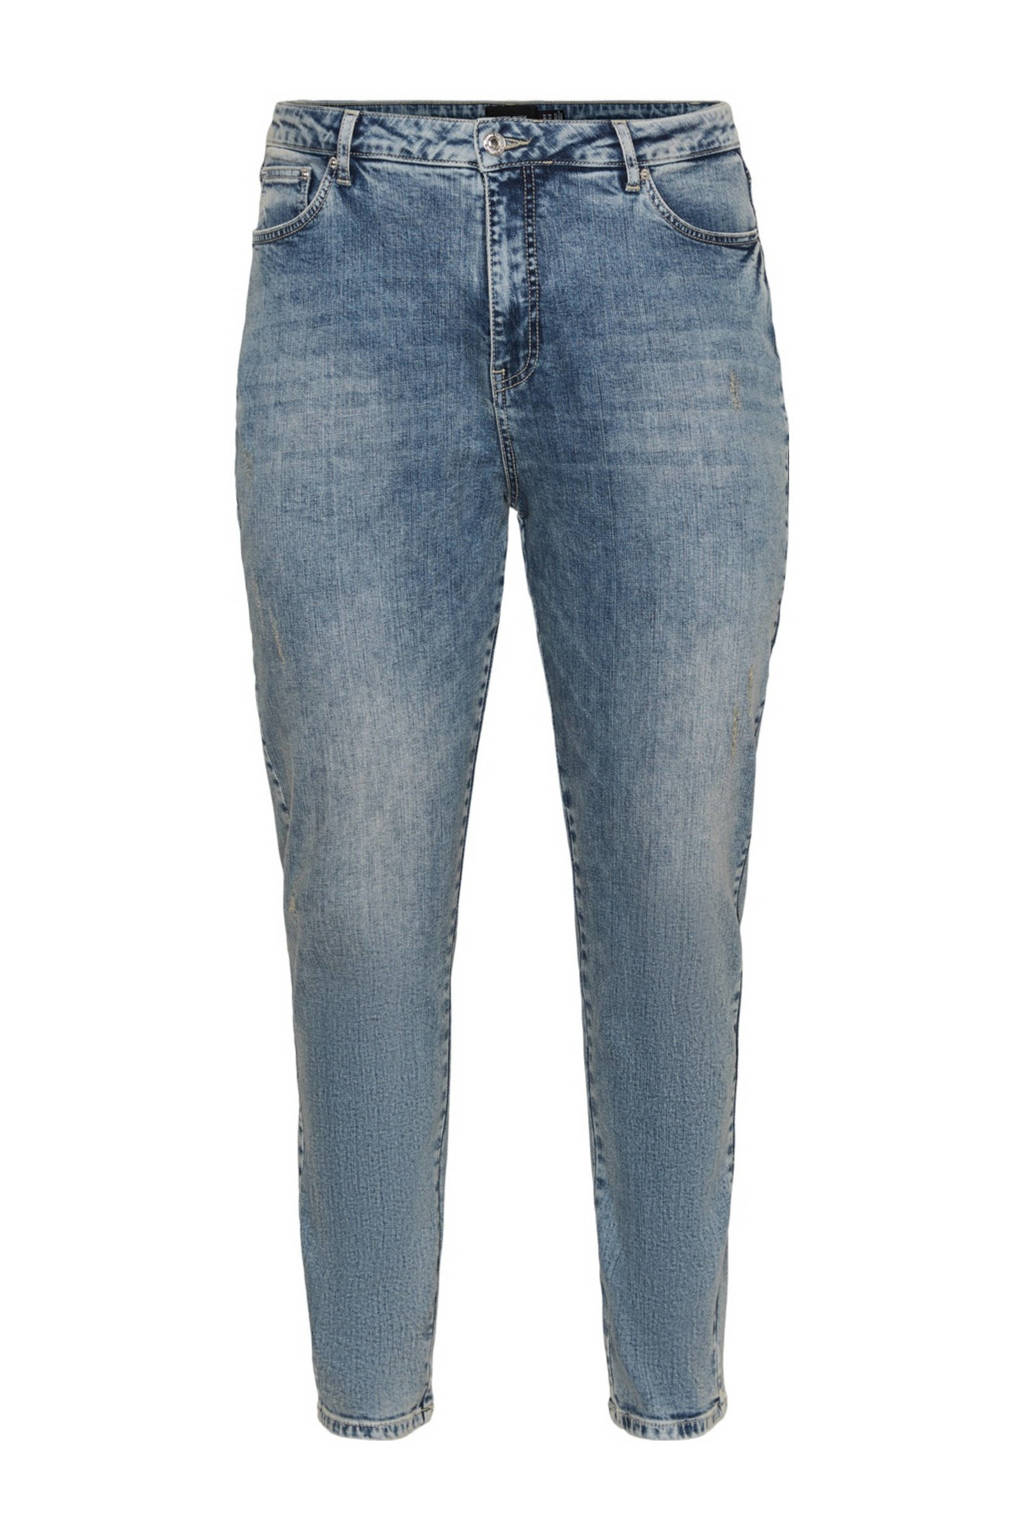 VERO MODA CURVE high waist mom jeans VMVIBE blauw, Blauw